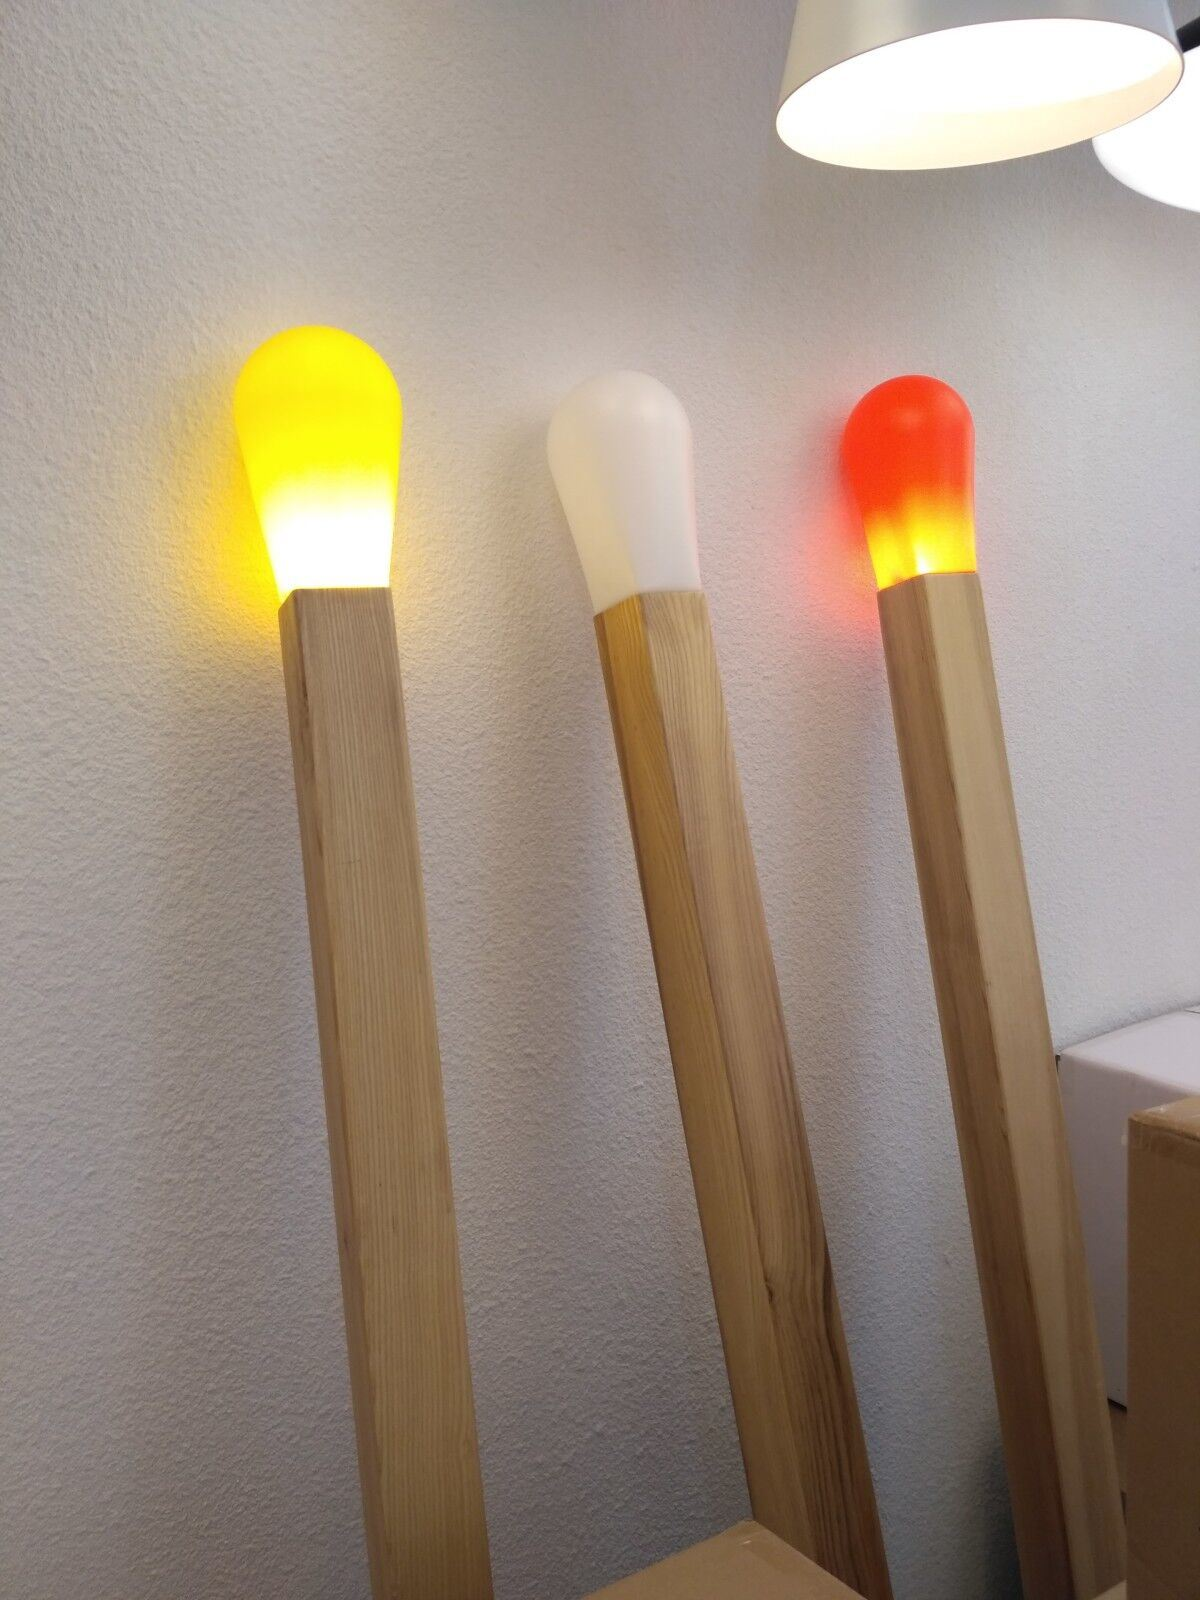 Fancy Wooden Floor Lamp Modern LED Decorative Standing Lighting